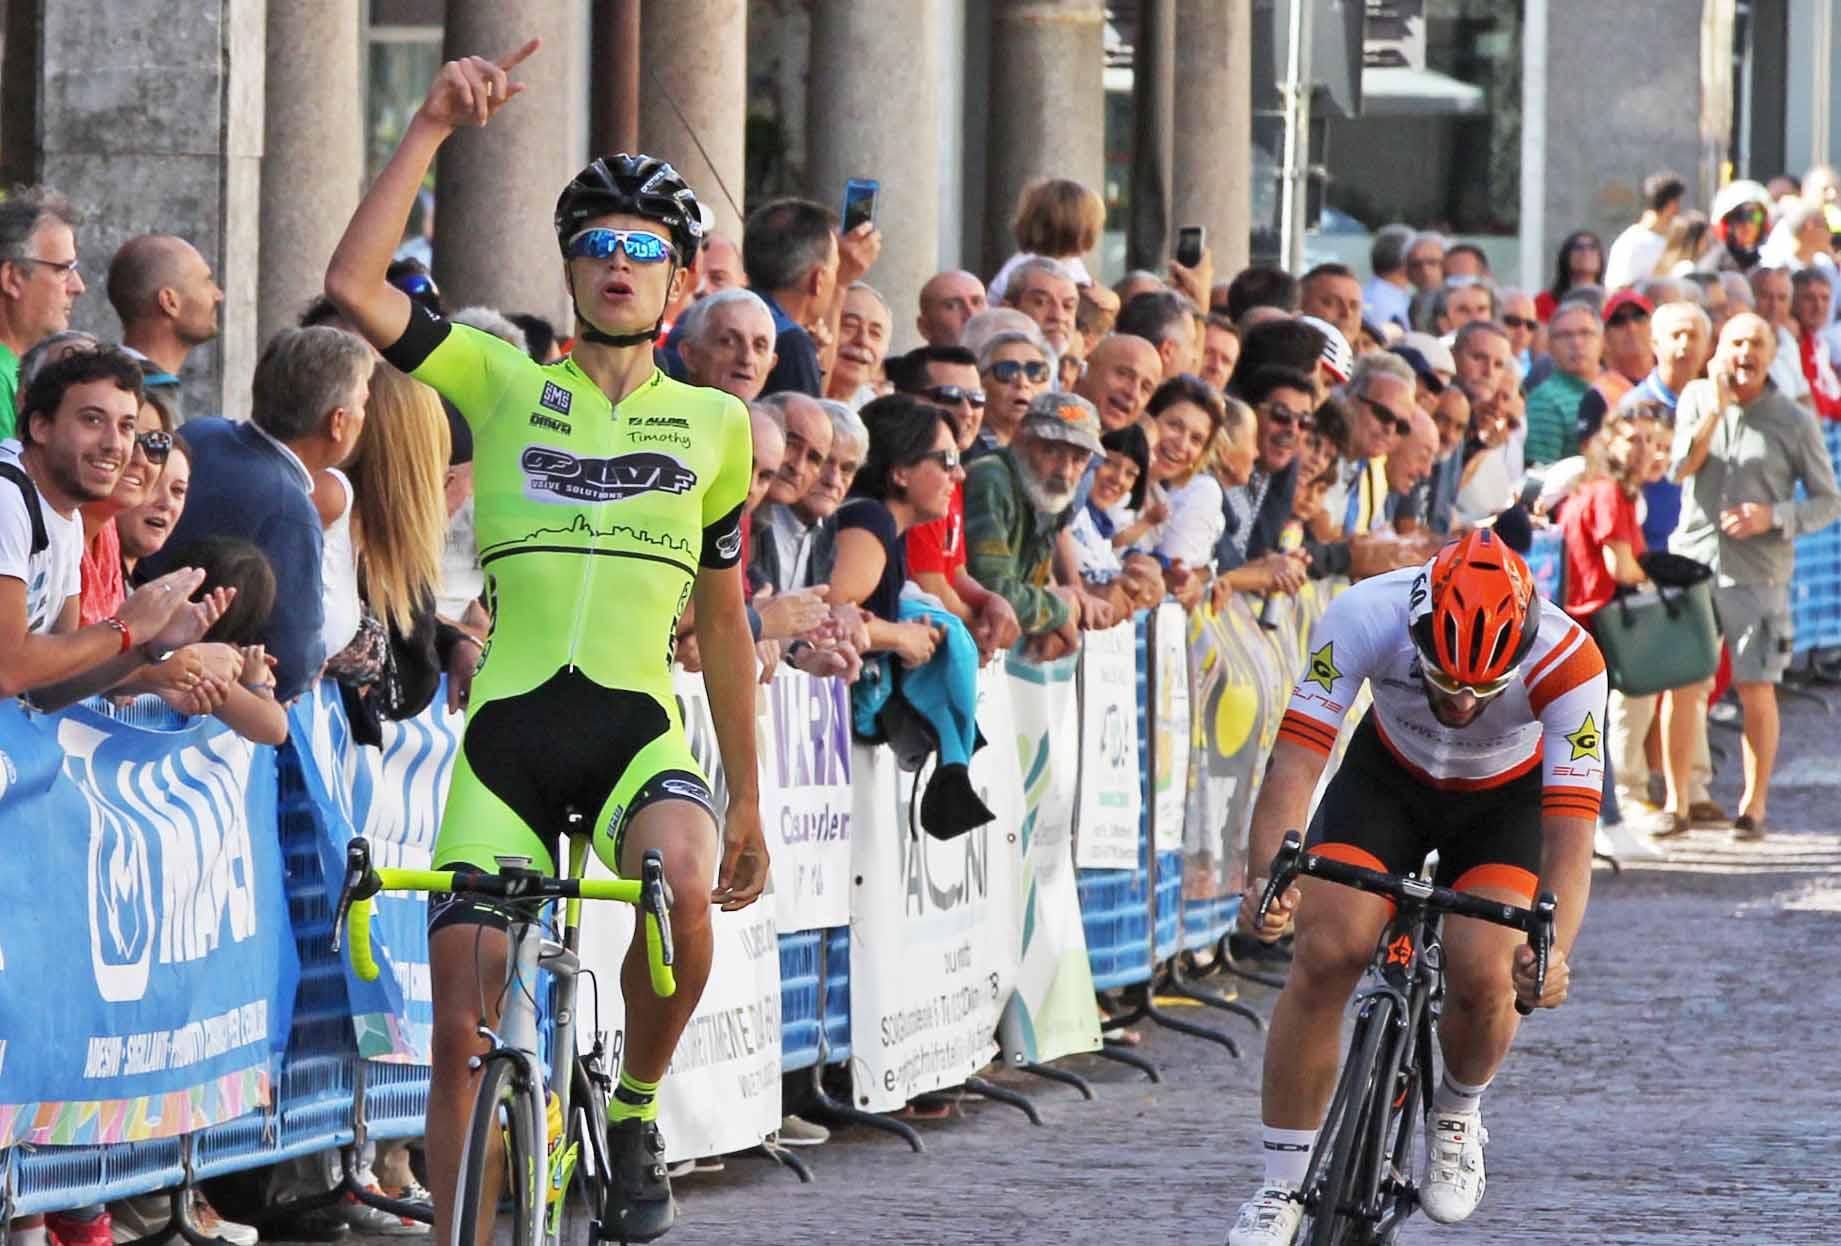 Andrea Berzi vince a Casalpusterlengo